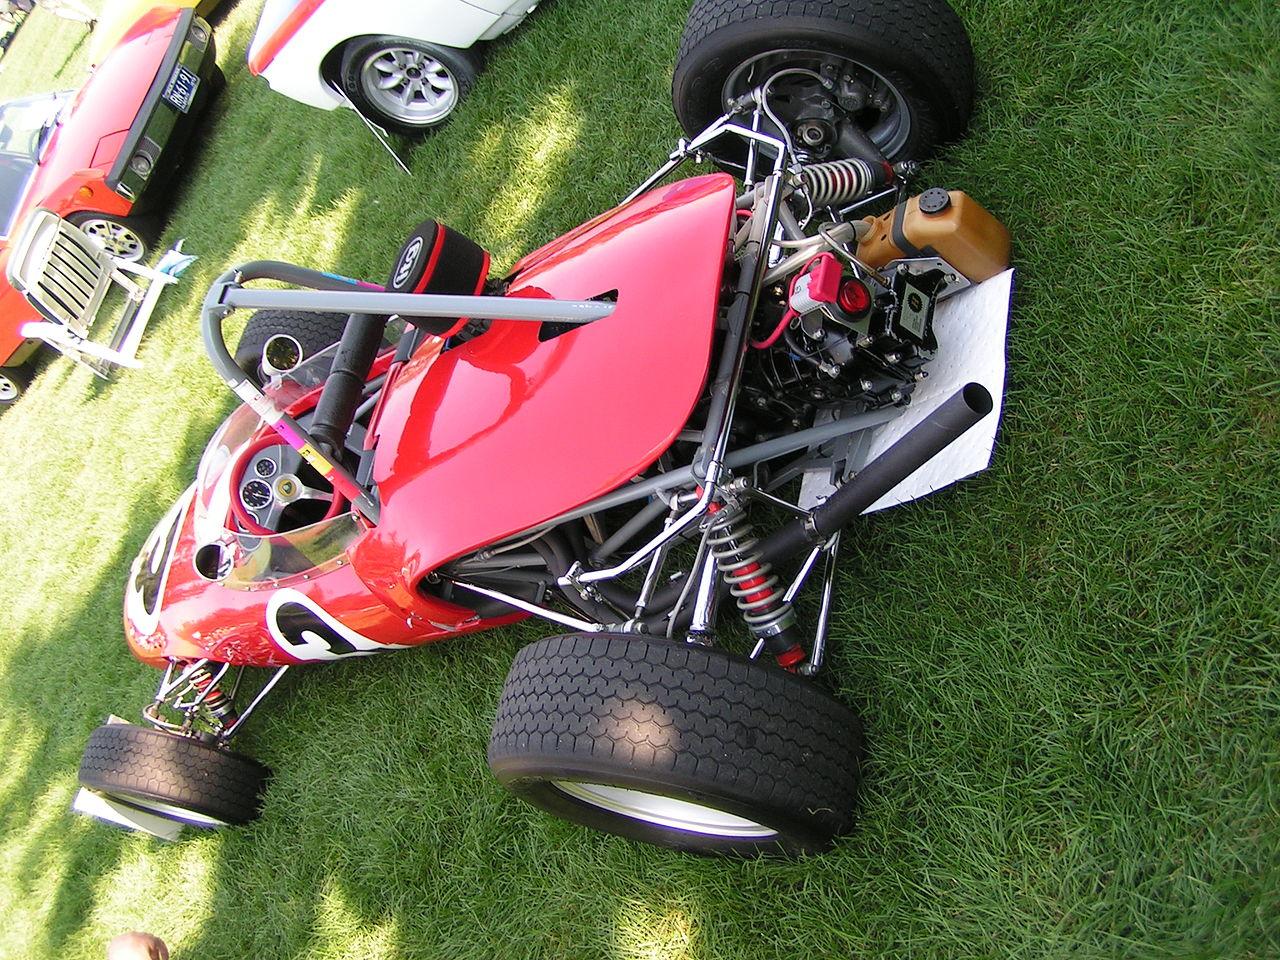 File:1968 Lotus 51B Formula Ford (932060659).jpg - Wikimedia Commons